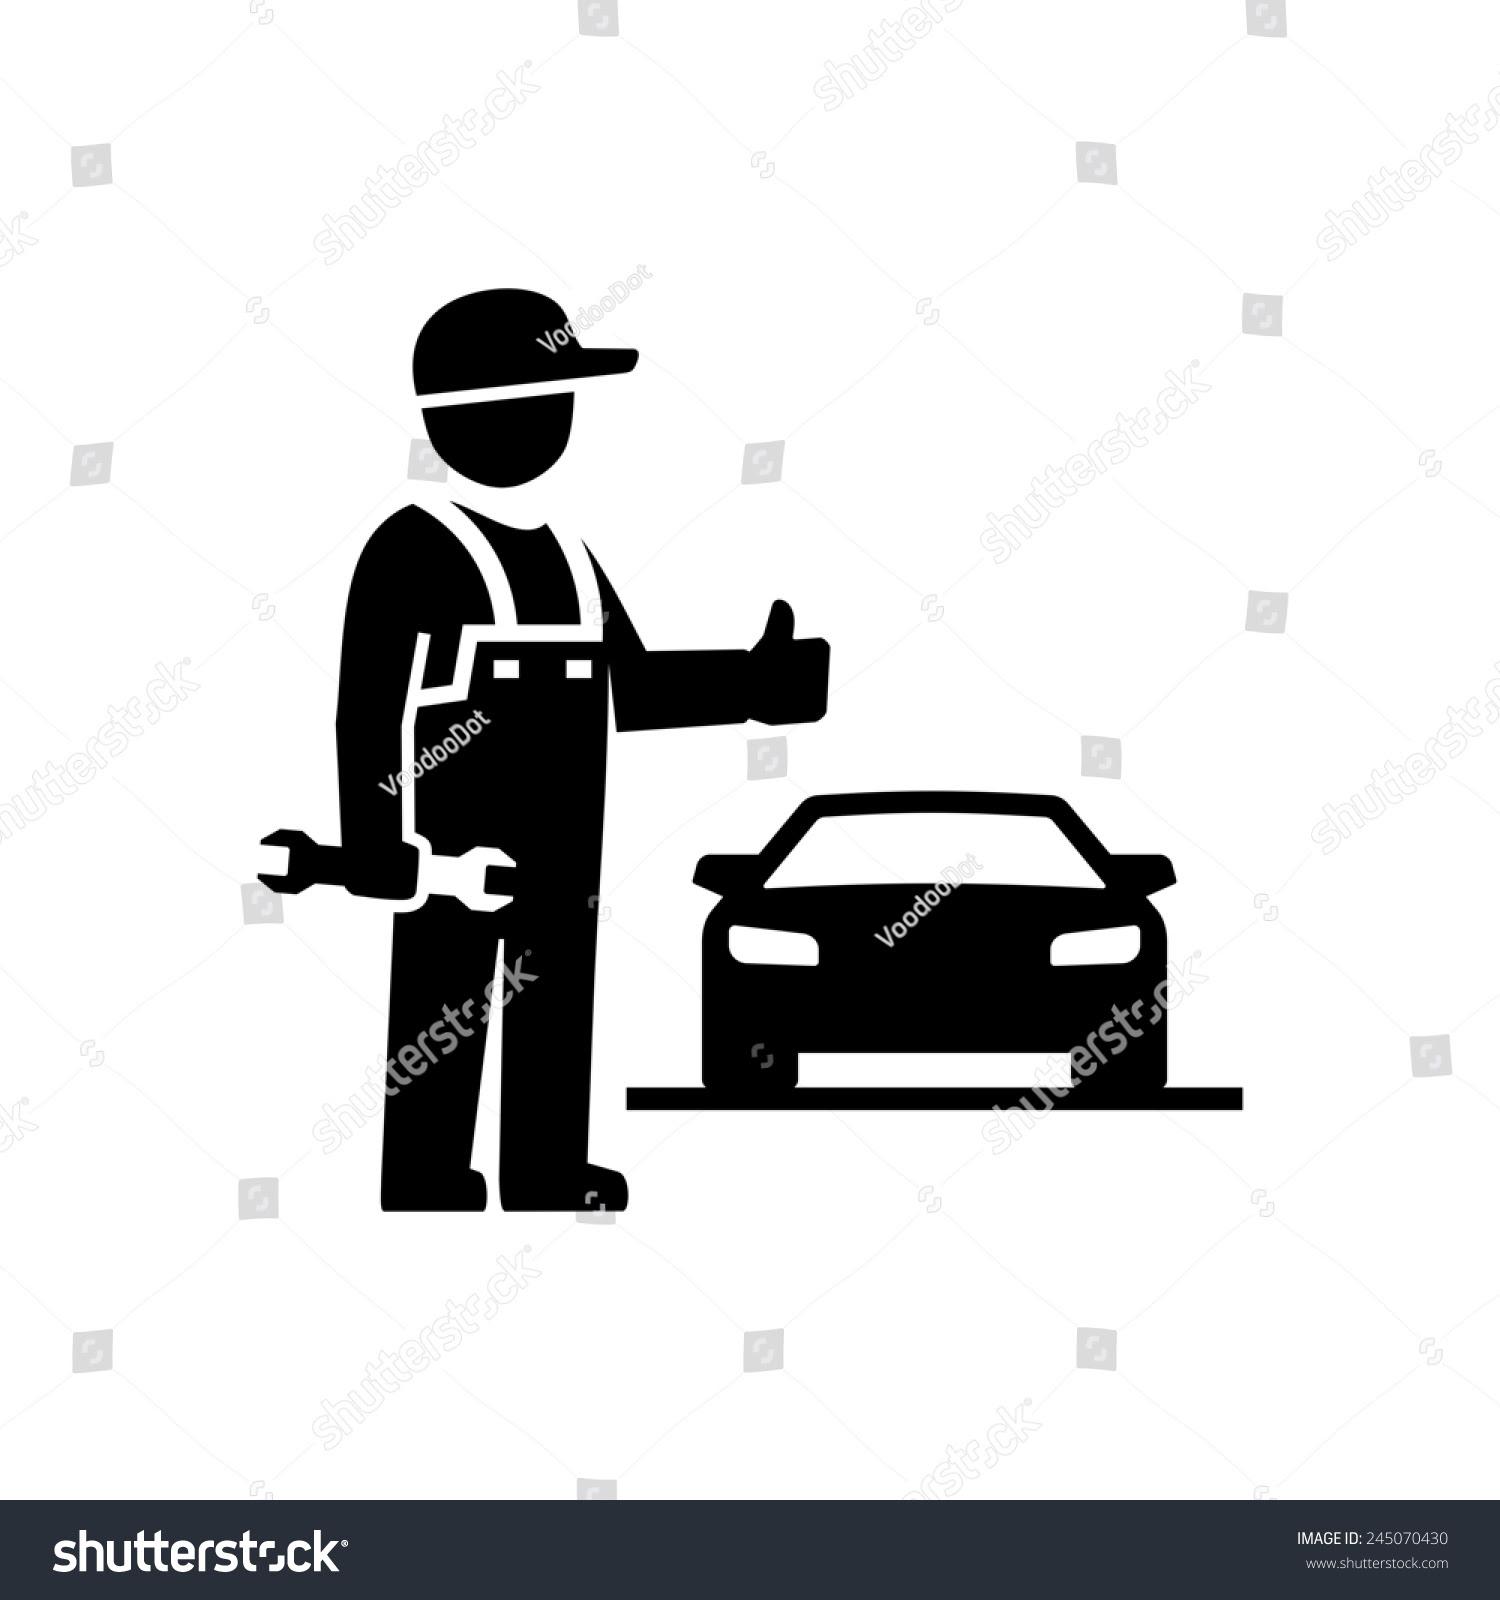 Car Mechanic Showing Thumb Figure Pictogram Stock ...